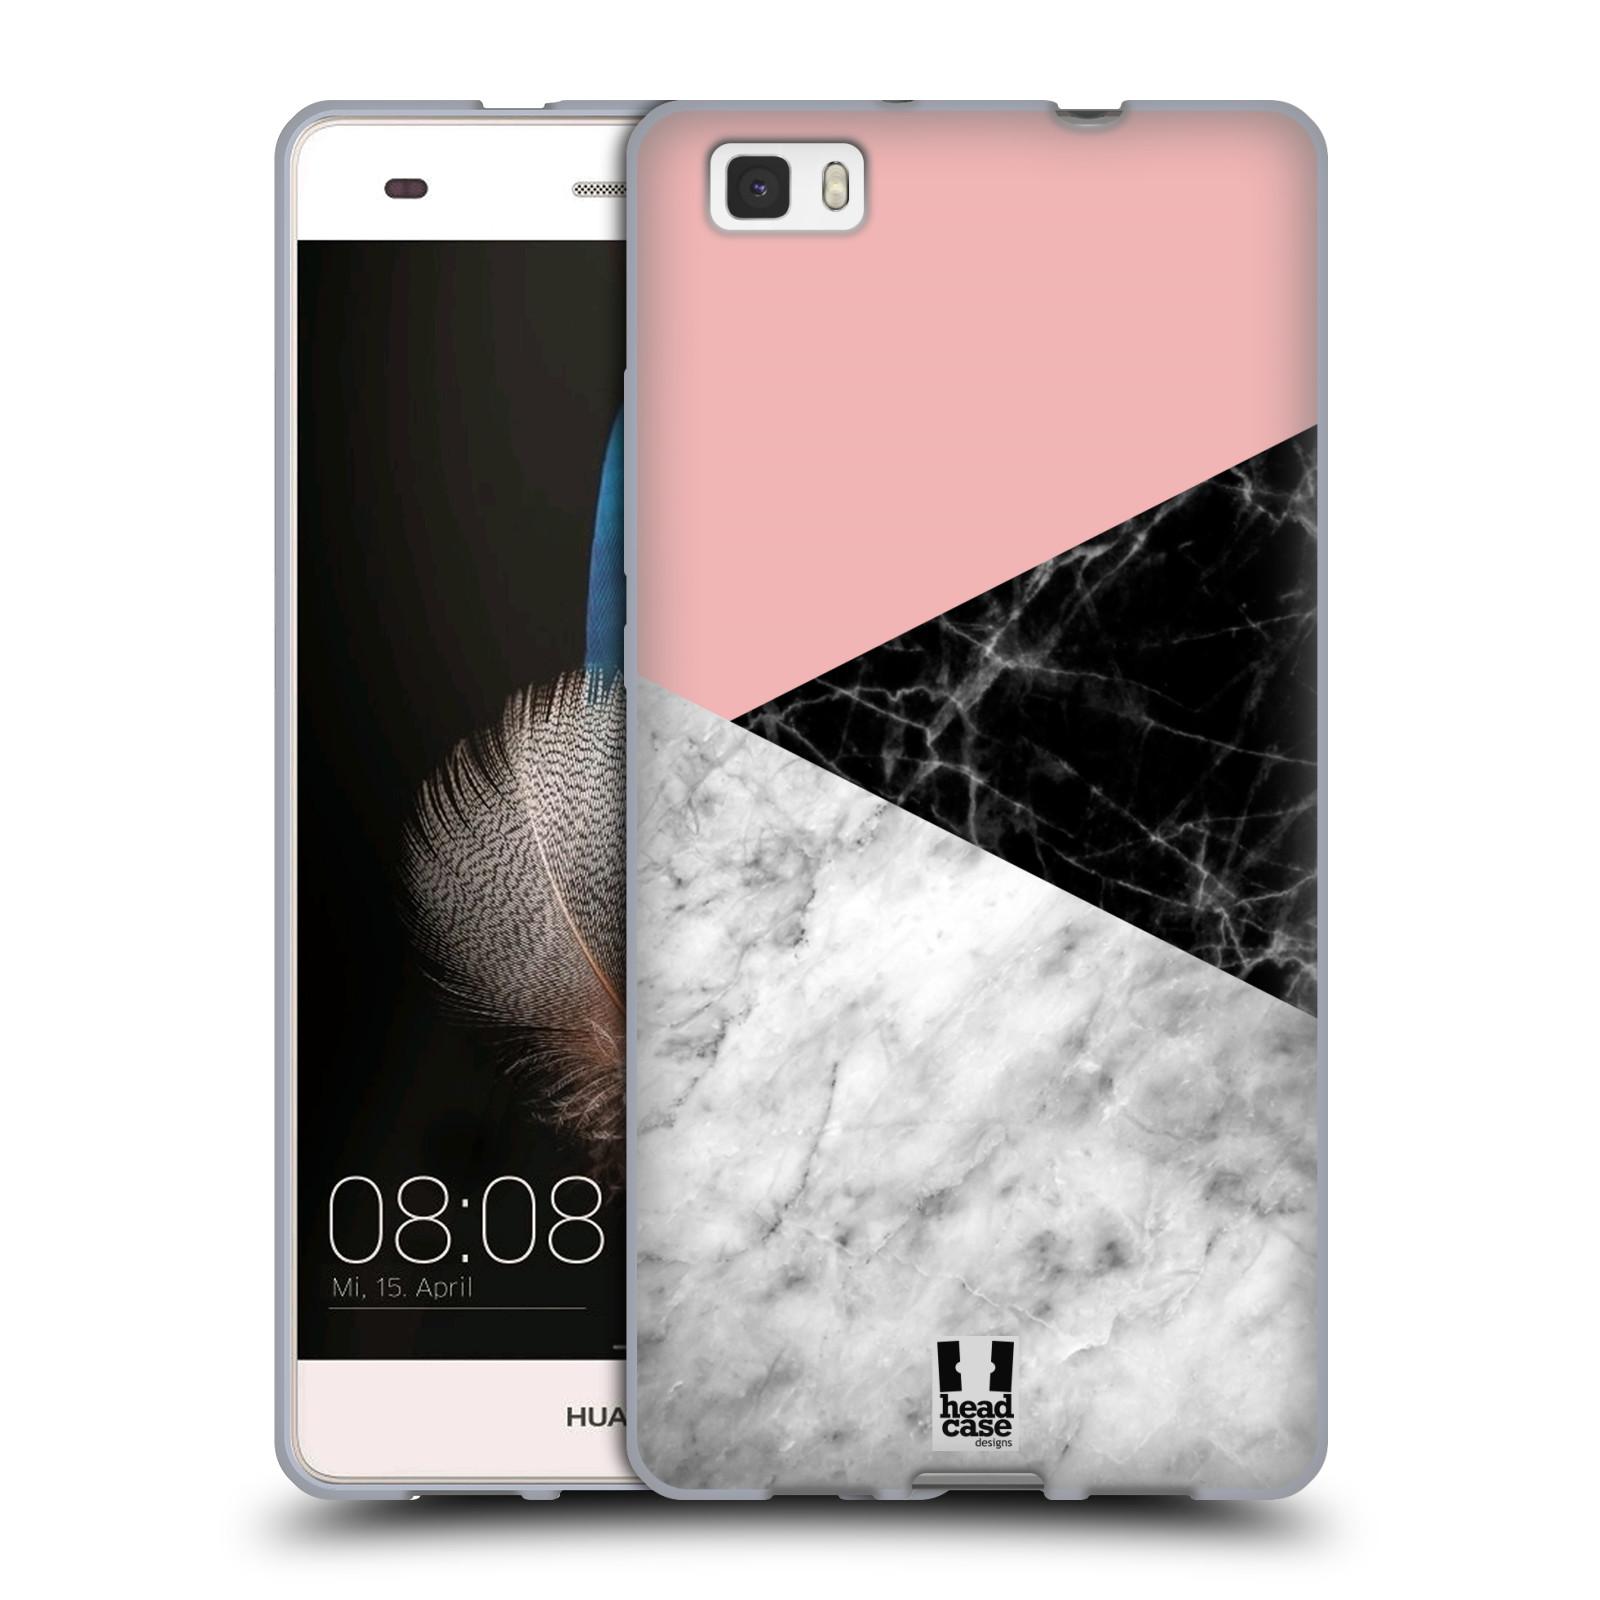 Silikonové pouzdro na mobil Huawei P8 Lite - Head Case - Mramor mix